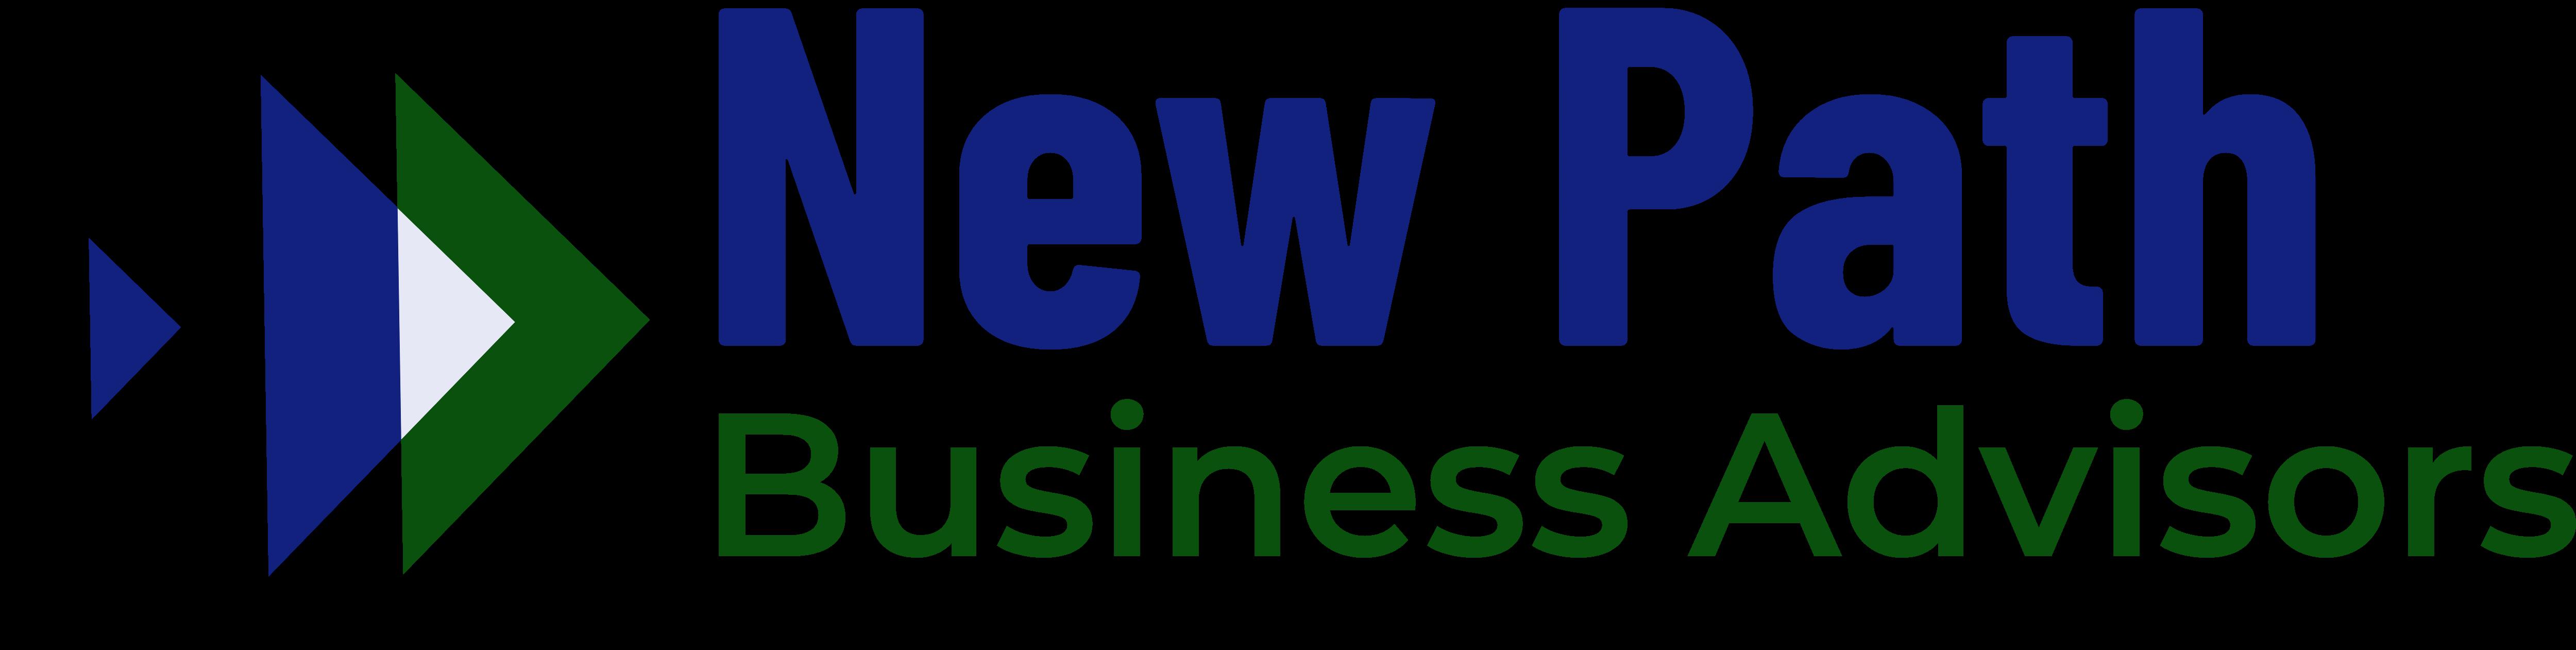 New Path Business Advisors